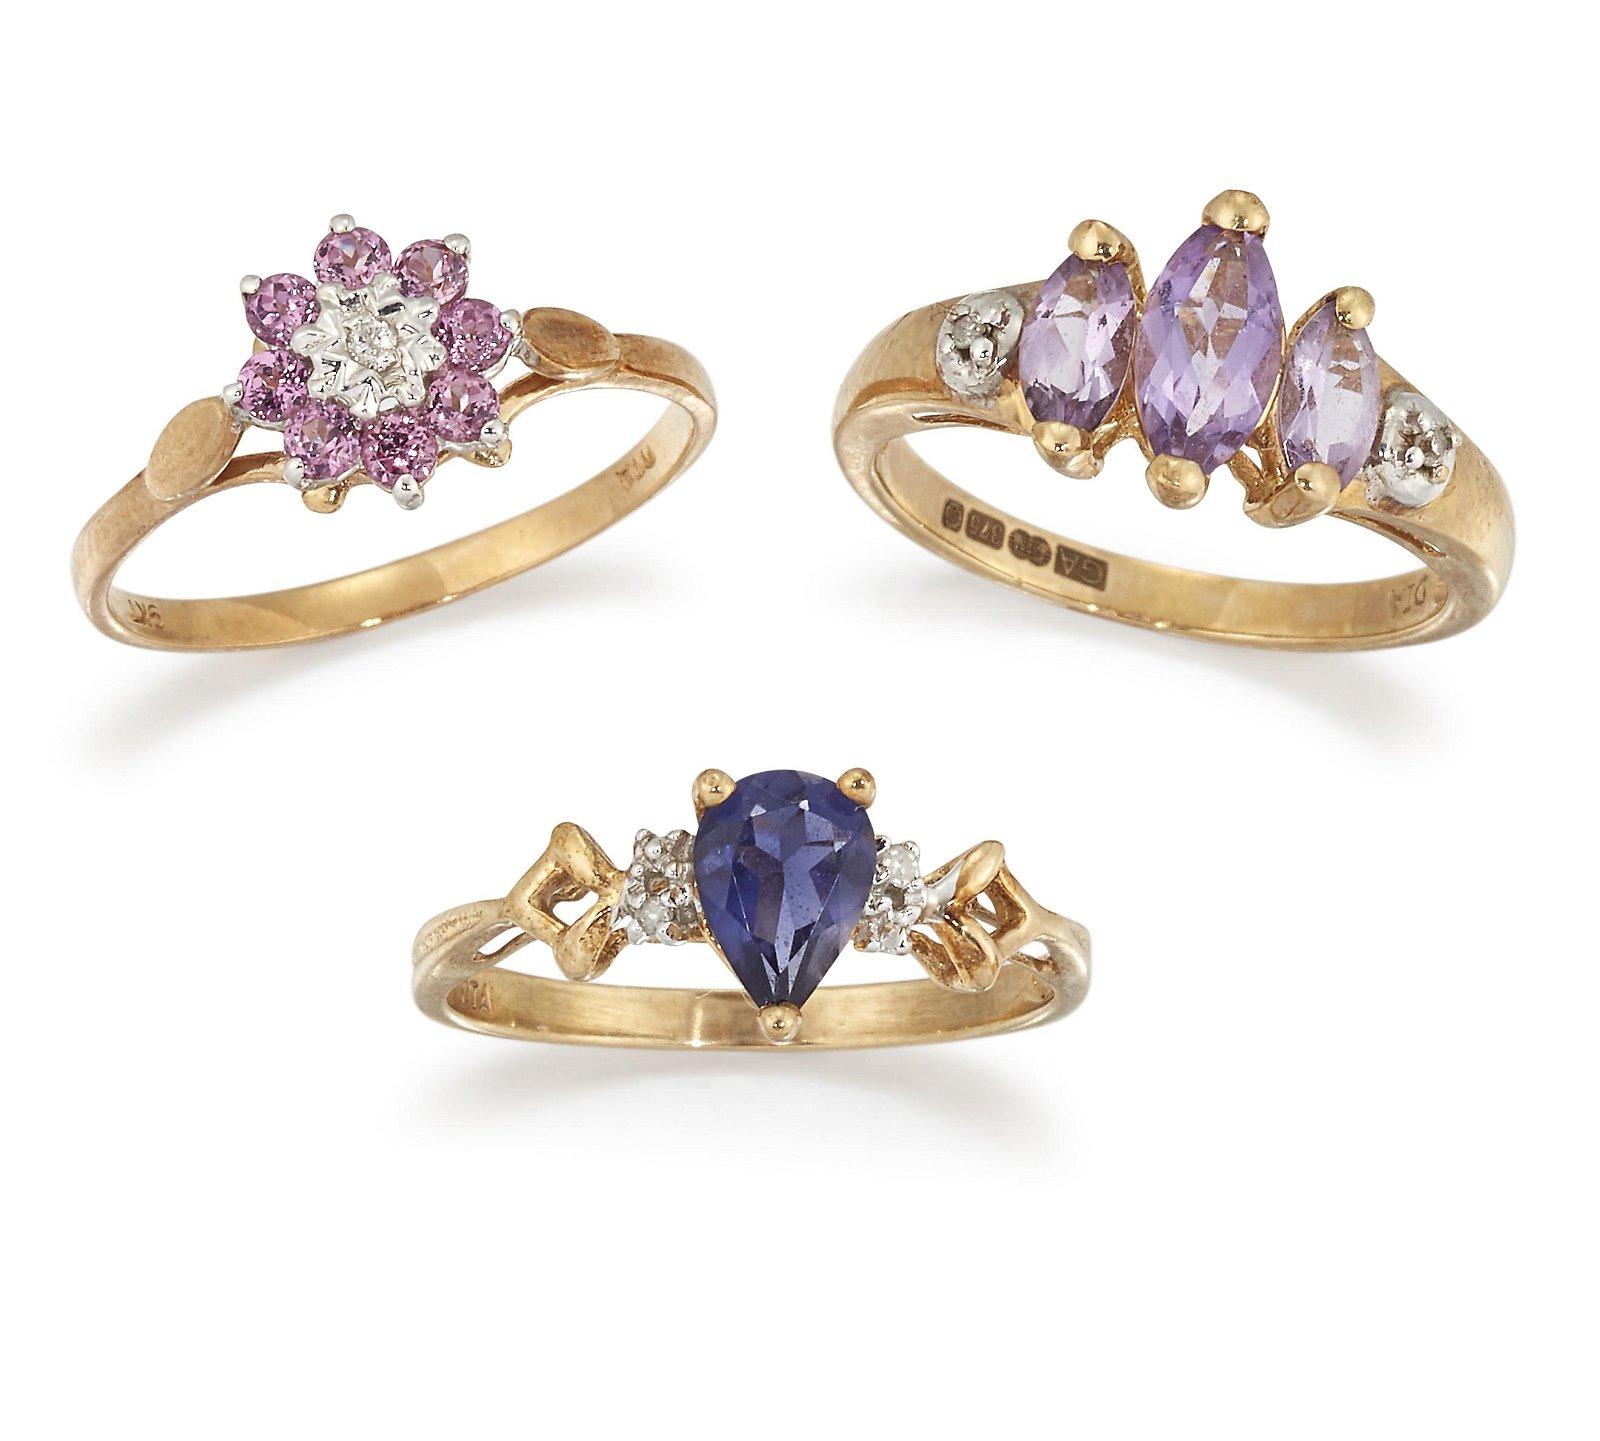 THREE 9CT DIAMOND AND GEMSET RINGS, a three stone